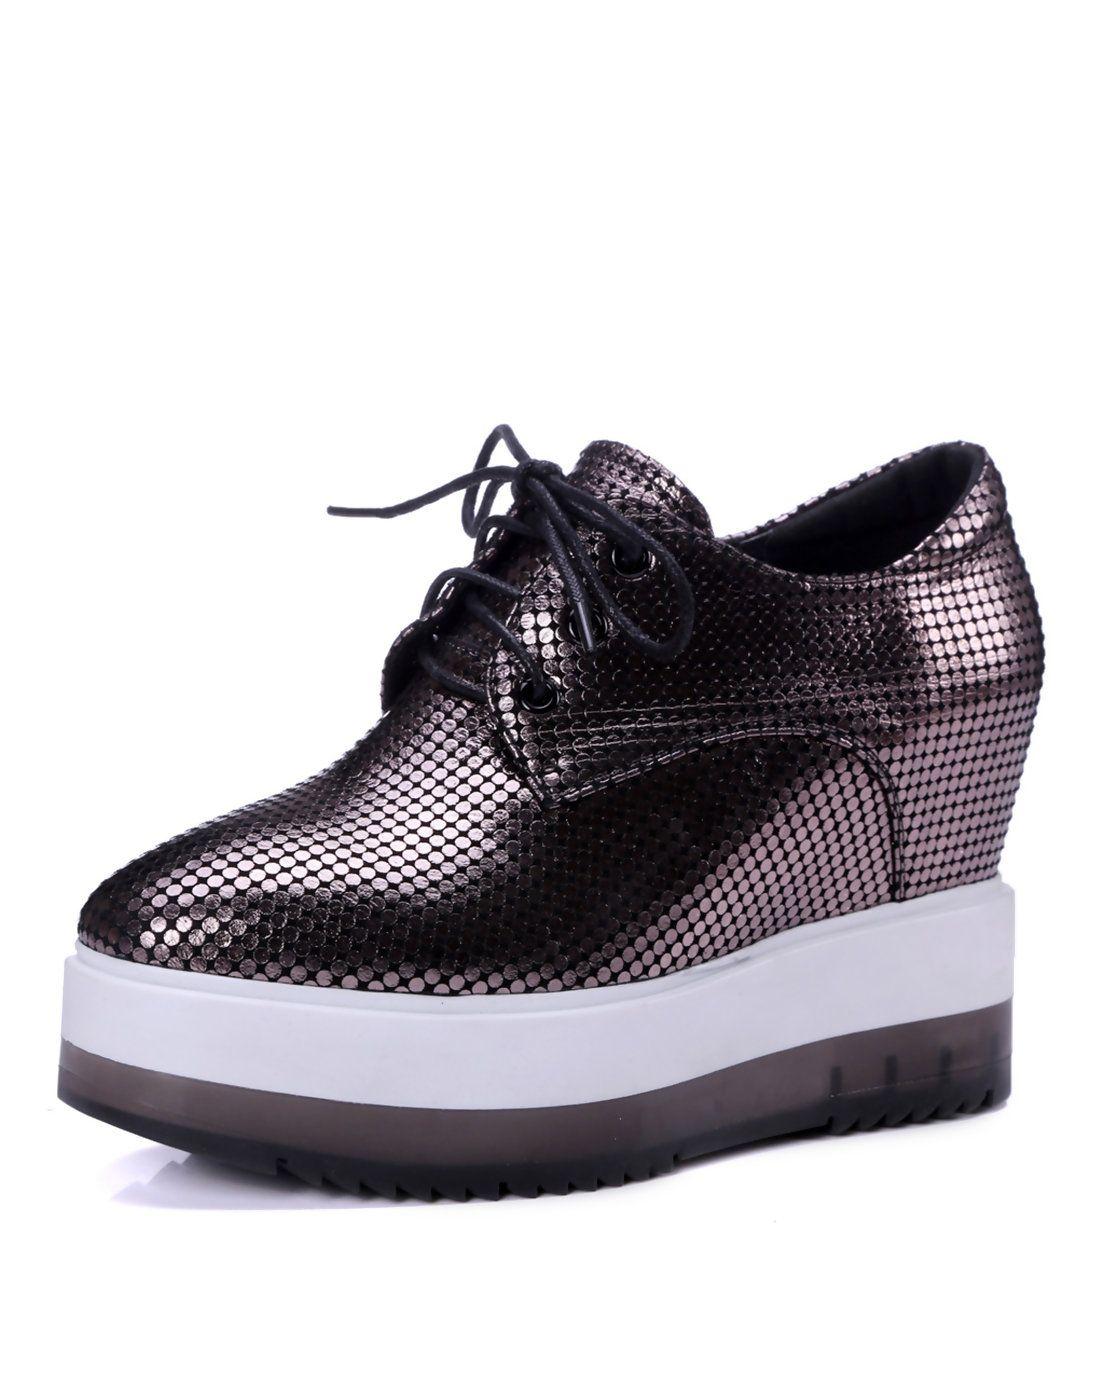 fca574c20a3d  AdoreWe  VIPme (VIPSHOP Global) Mens - naiyee Dark Gray Printed Leather  Lace Up Wedge Lady Sneakers - AdoreWe.com